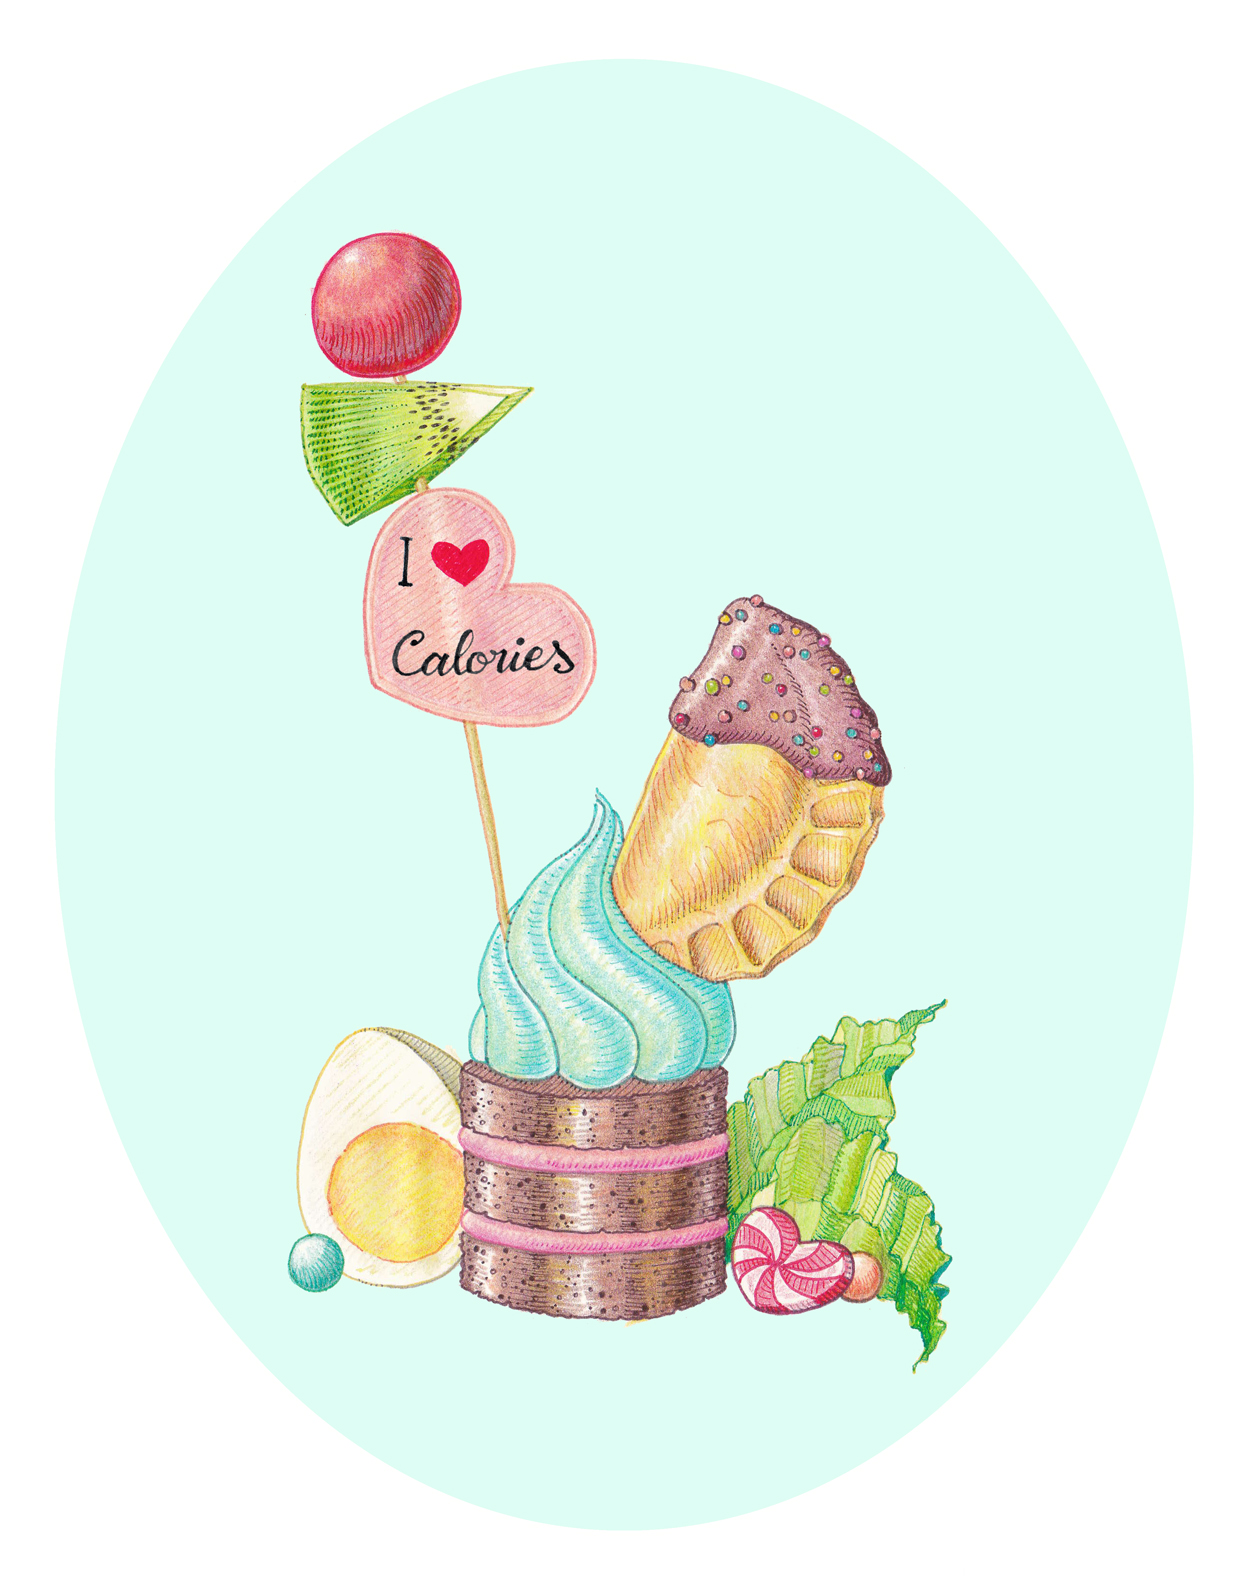 i love calories04.jpg